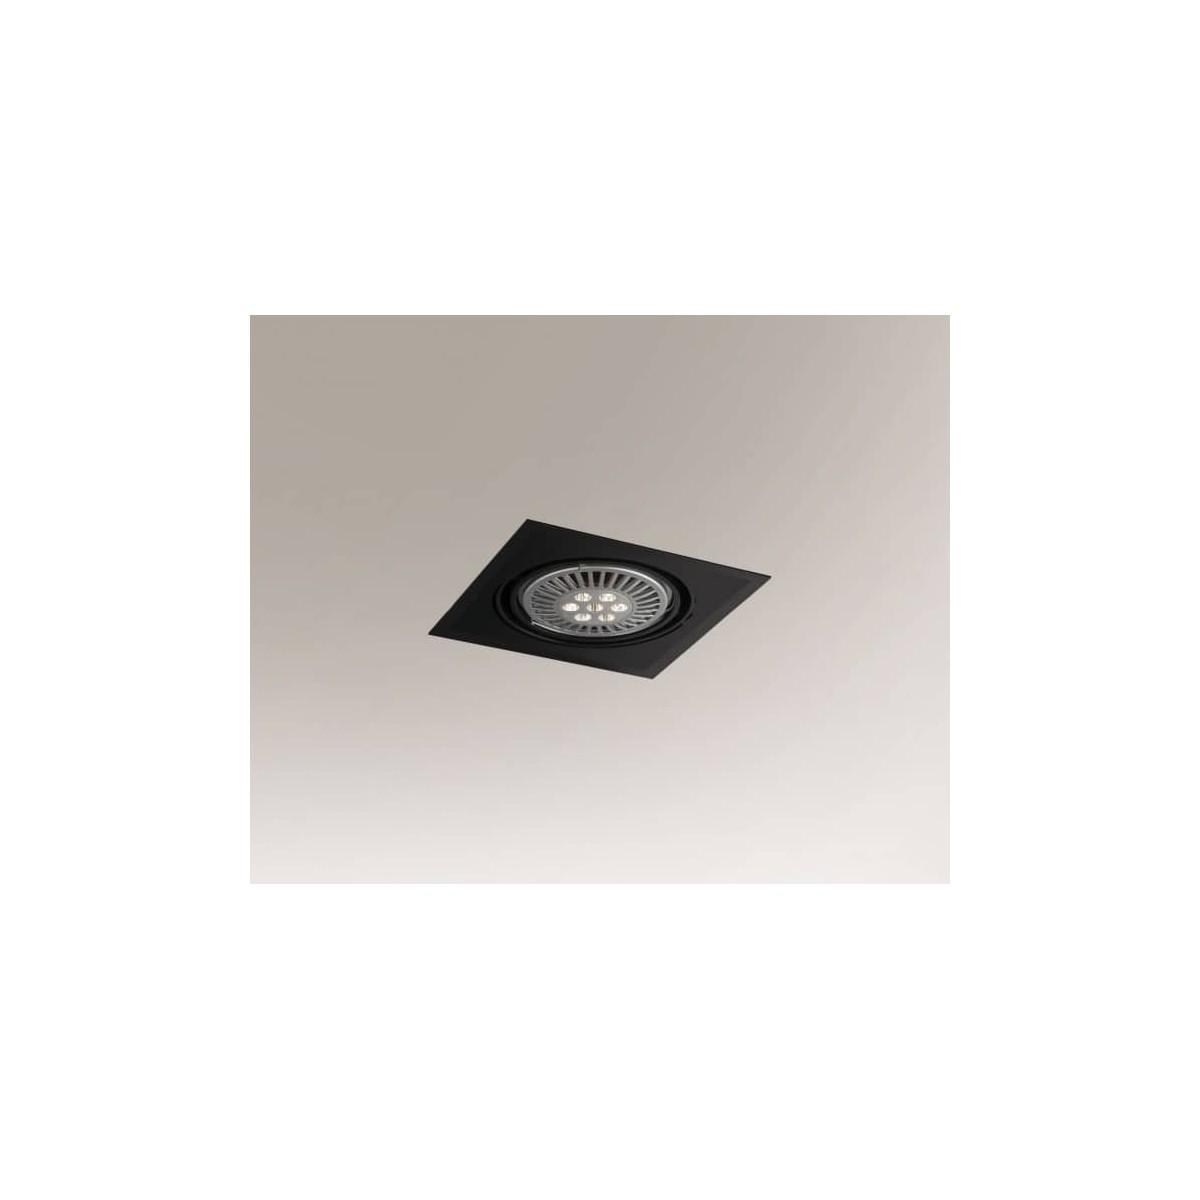 Shilo MUKO H 1xES111 230V czarny wpuszczana 3355